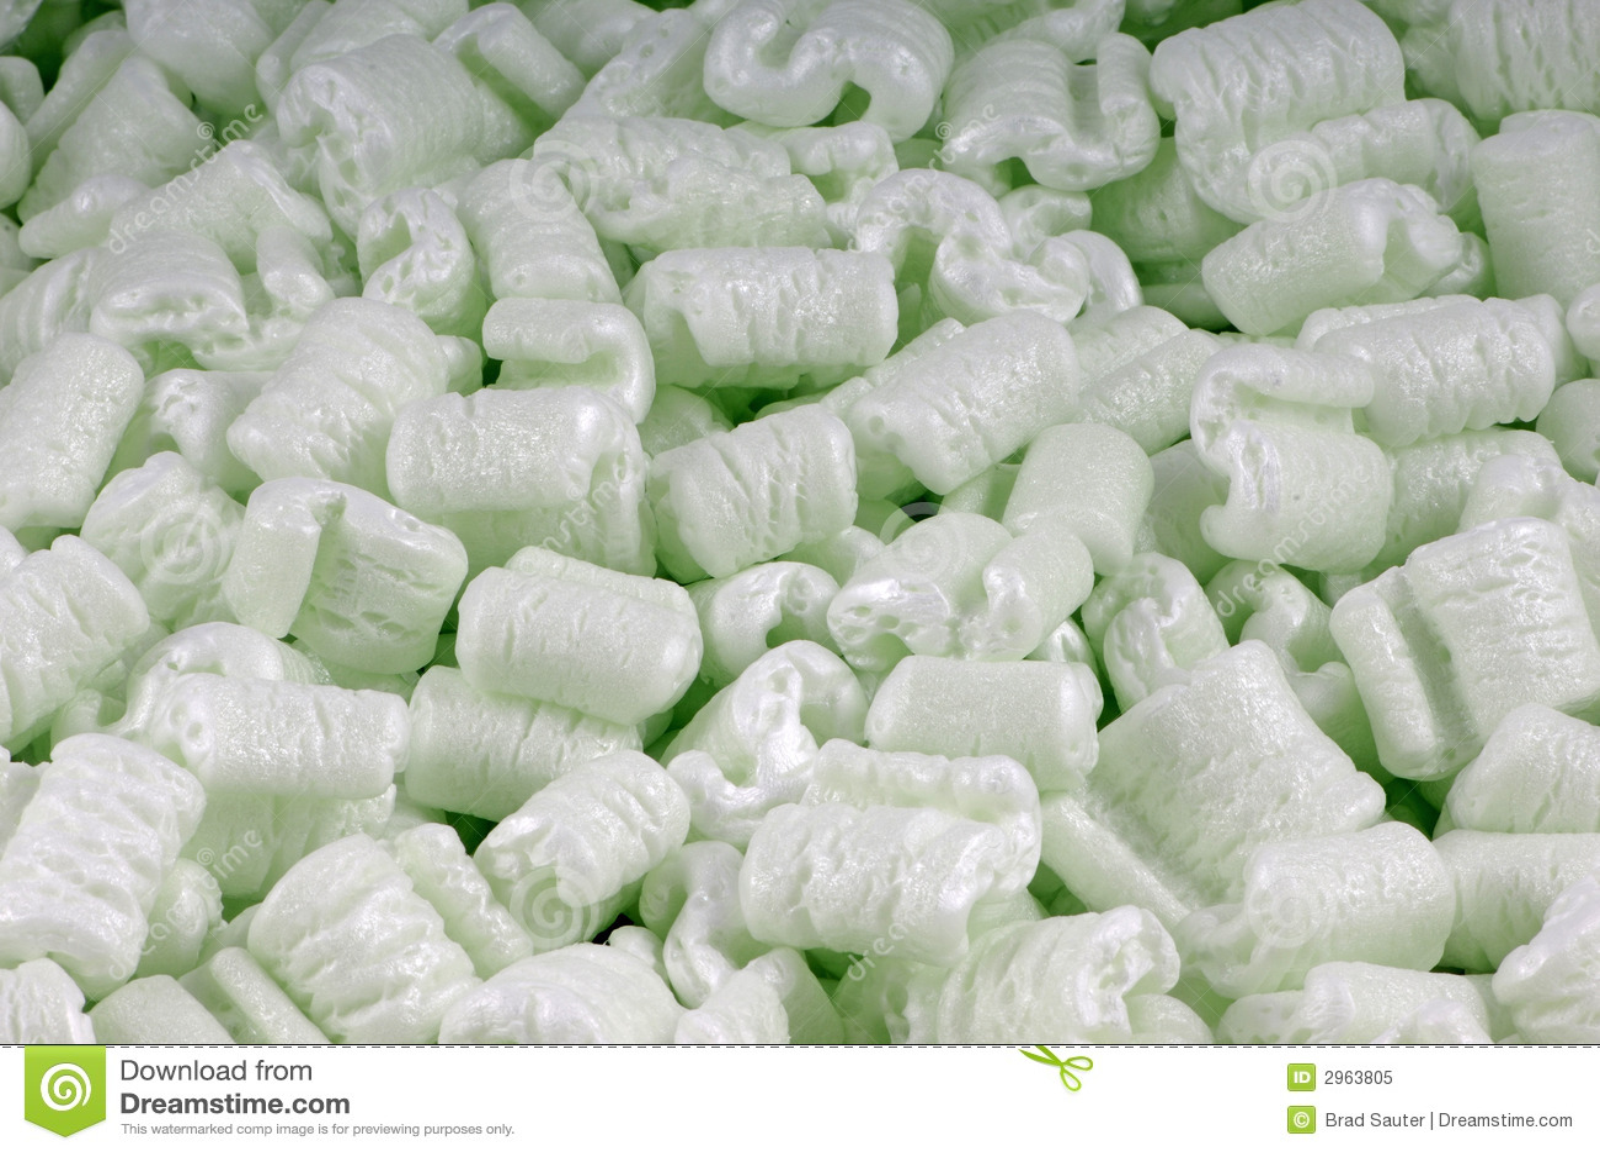 green foam peanuts stock image  image of dampen  material